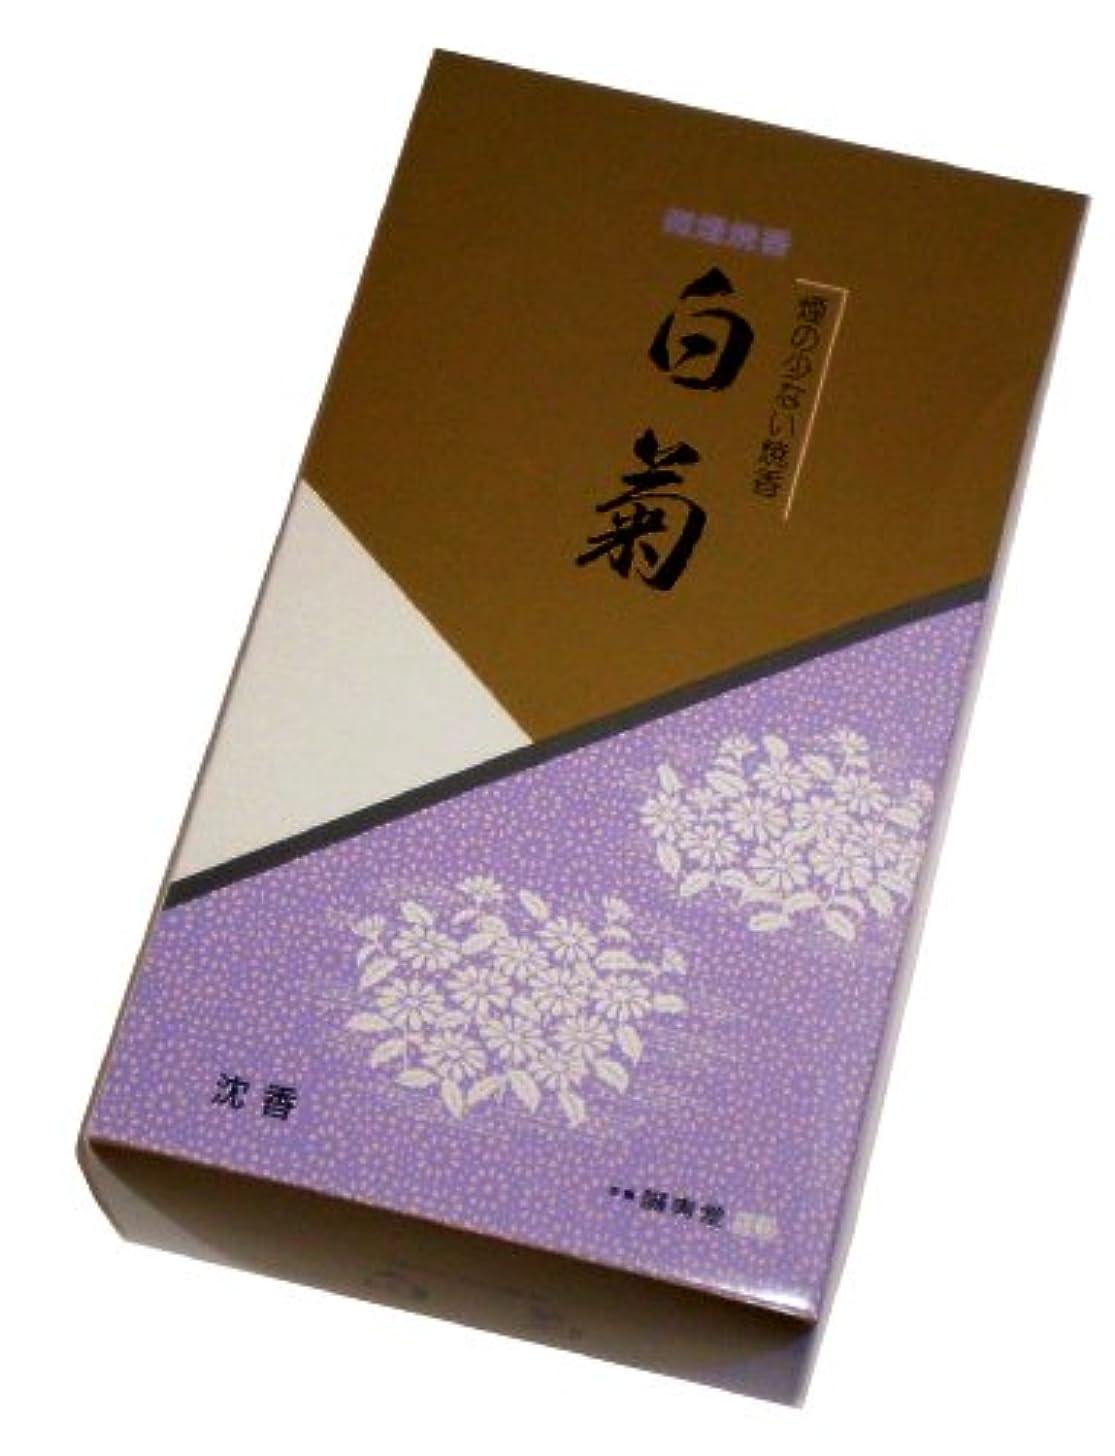 前奏曲マグ技術者誠寿堂のお線香 微煙焼香 白菊(沈香) 500g #J21